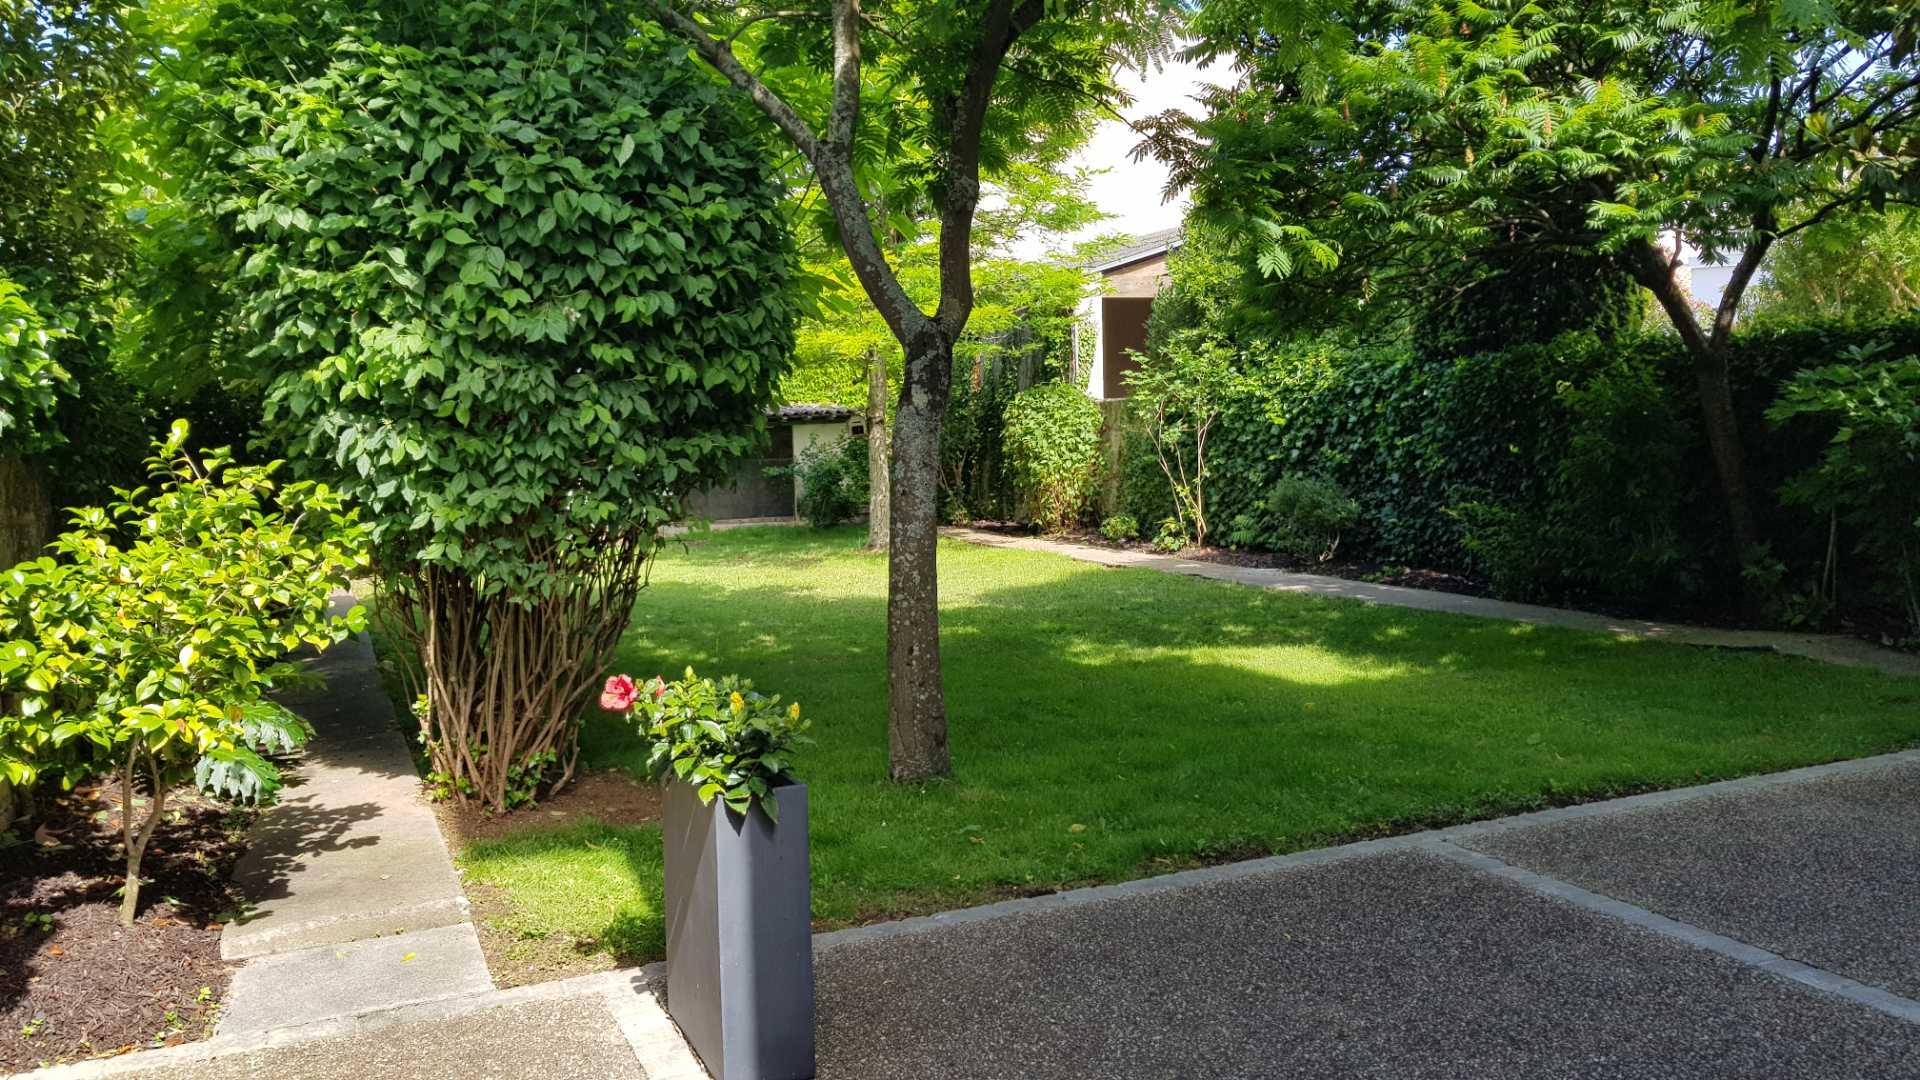 rochelle location vacances jardin